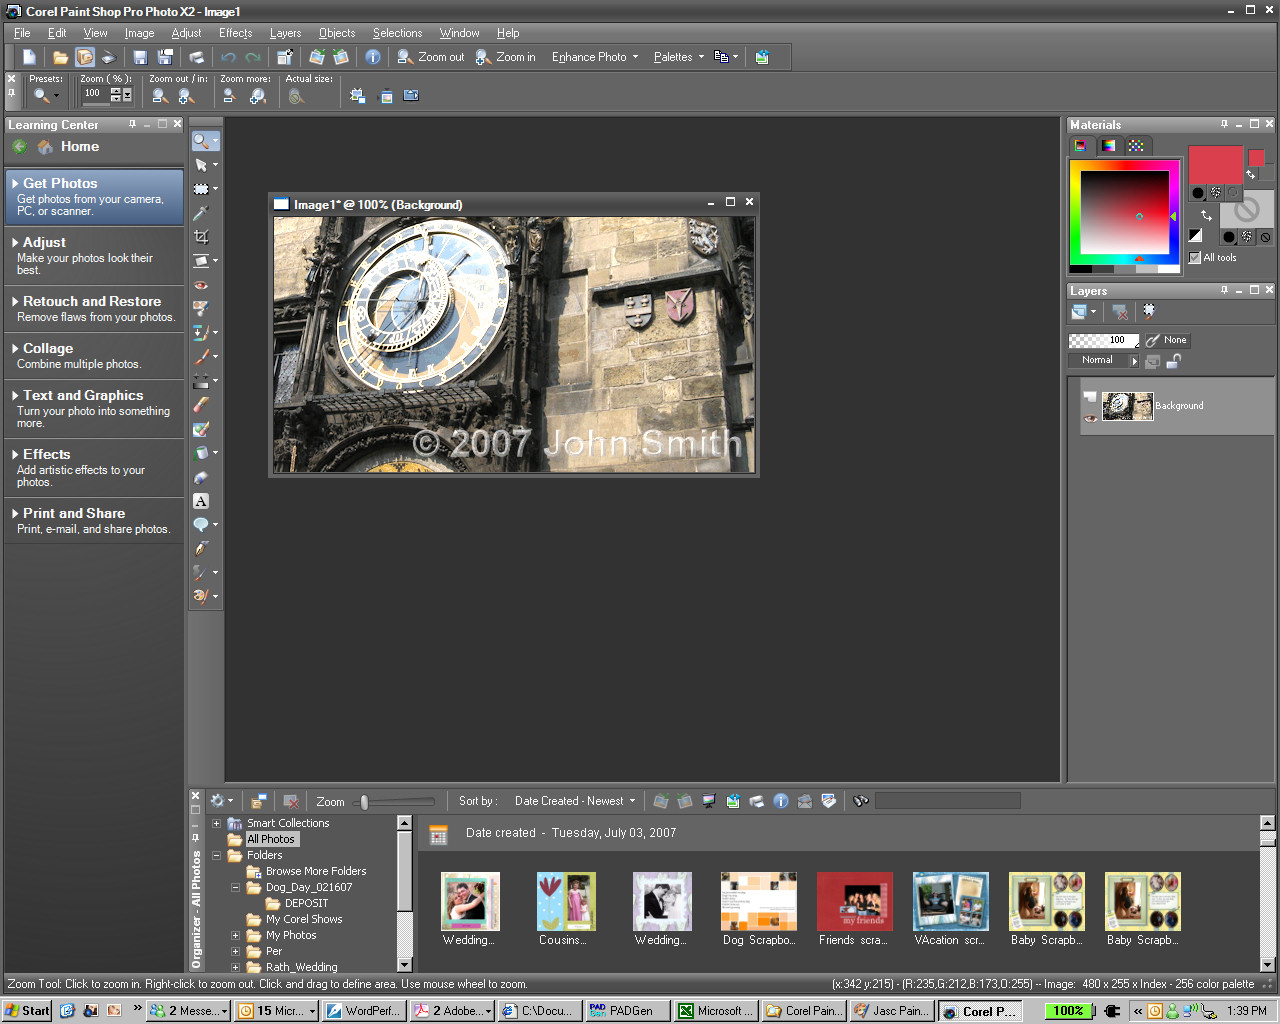 Mytopfiles programs paint shop pro photo x2 pspp12 for Paint pros